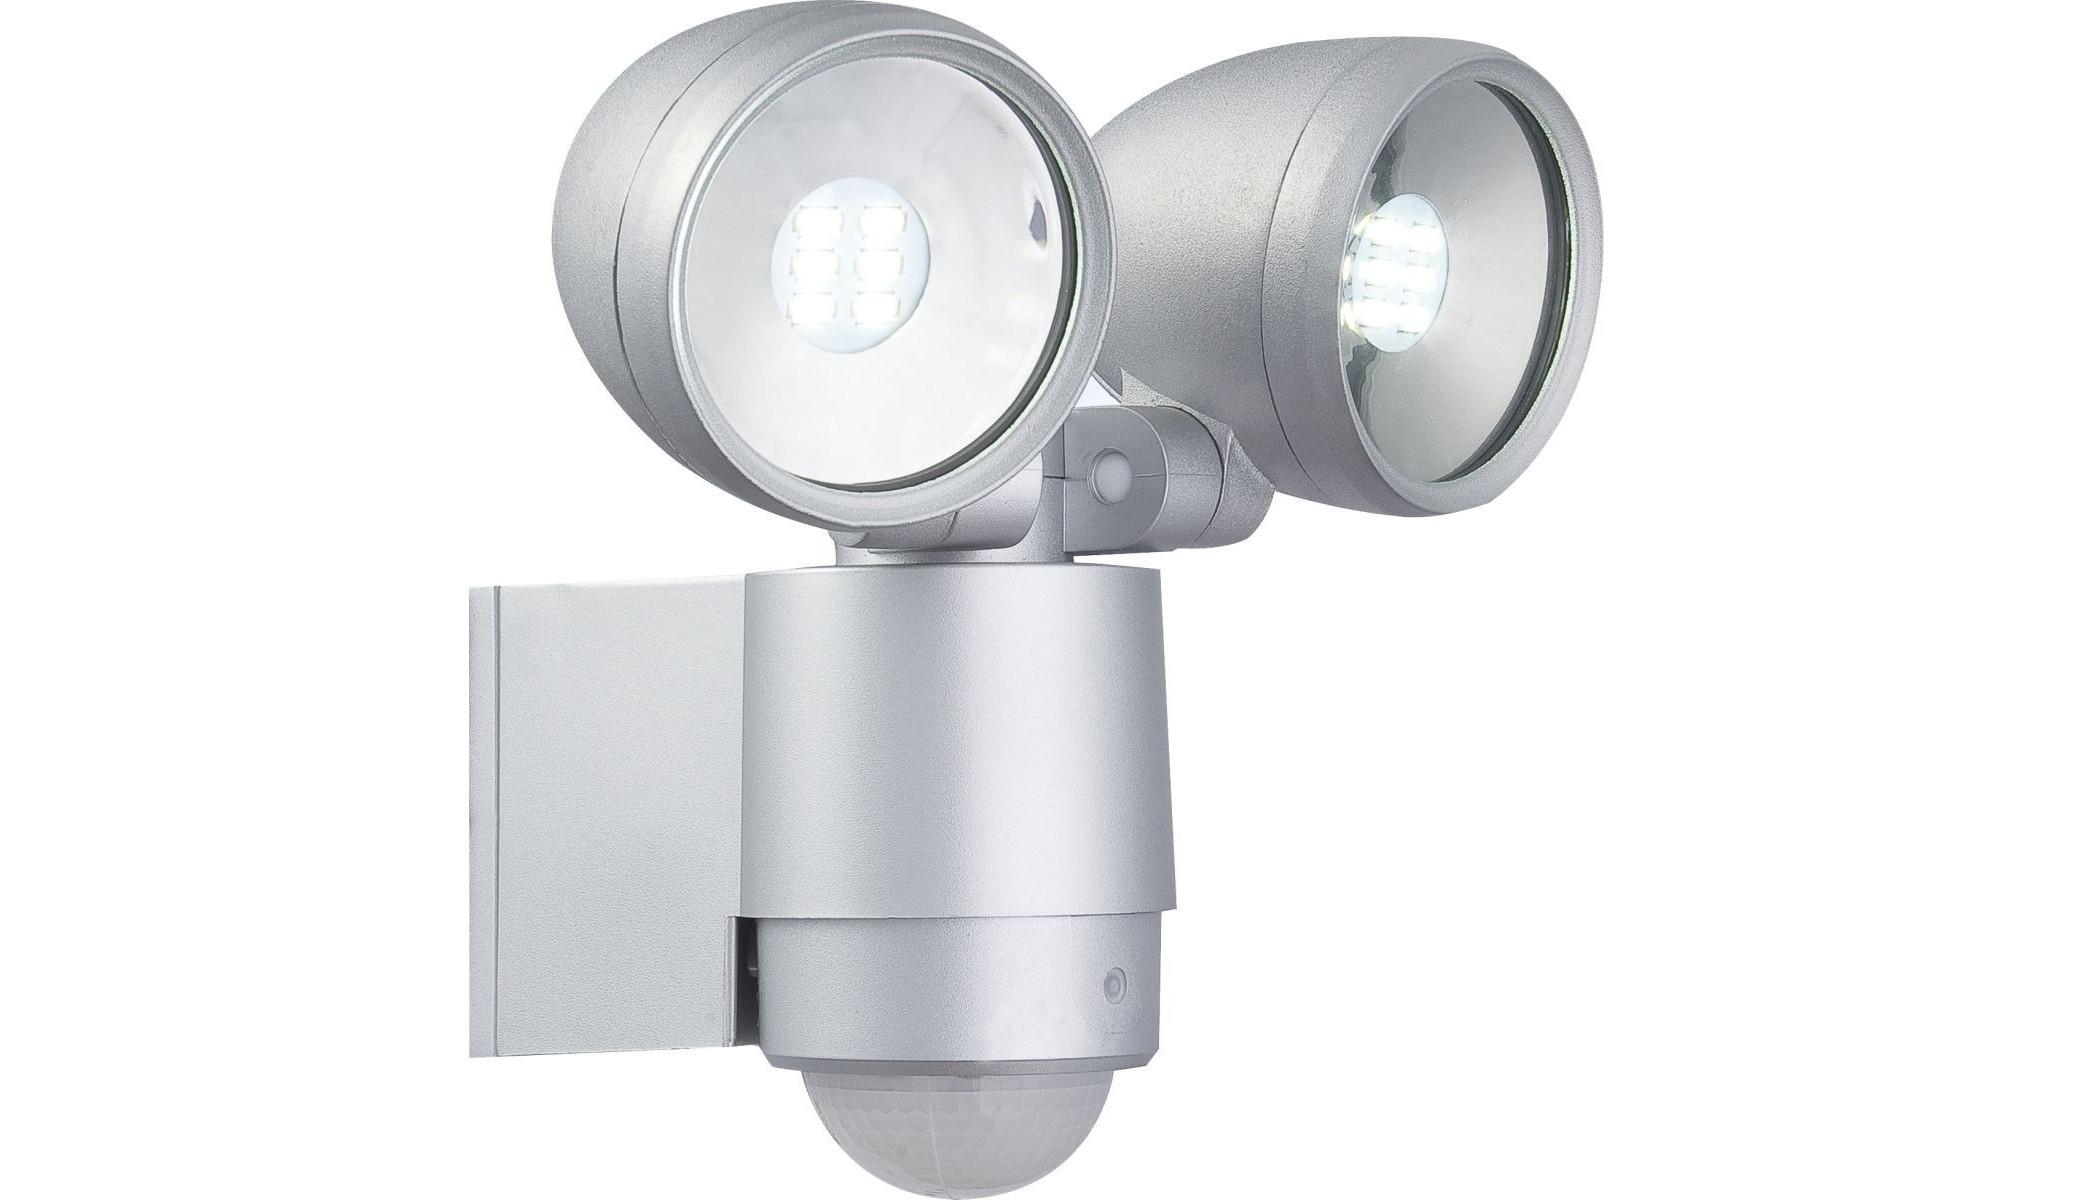 Светильник уличныйУличные настенные светильники<br>&amp;lt;div&amp;gt;Вид цоколя: LED&amp;lt;/div&amp;gt;&amp;lt;div&amp;gt;Мощность: 3W&amp;lt;/div&amp;gt;&amp;lt;div&amp;gt;Количество ламп: 2&amp;lt;/div&amp;gt;&amp;lt;div&amp;gt;Наличие ламп: есть&amp;lt;/div&amp;gt;<br><br>Material: Алюминий<br>Width см: 18<br>Depth см: 14,5<br>Height см: 16